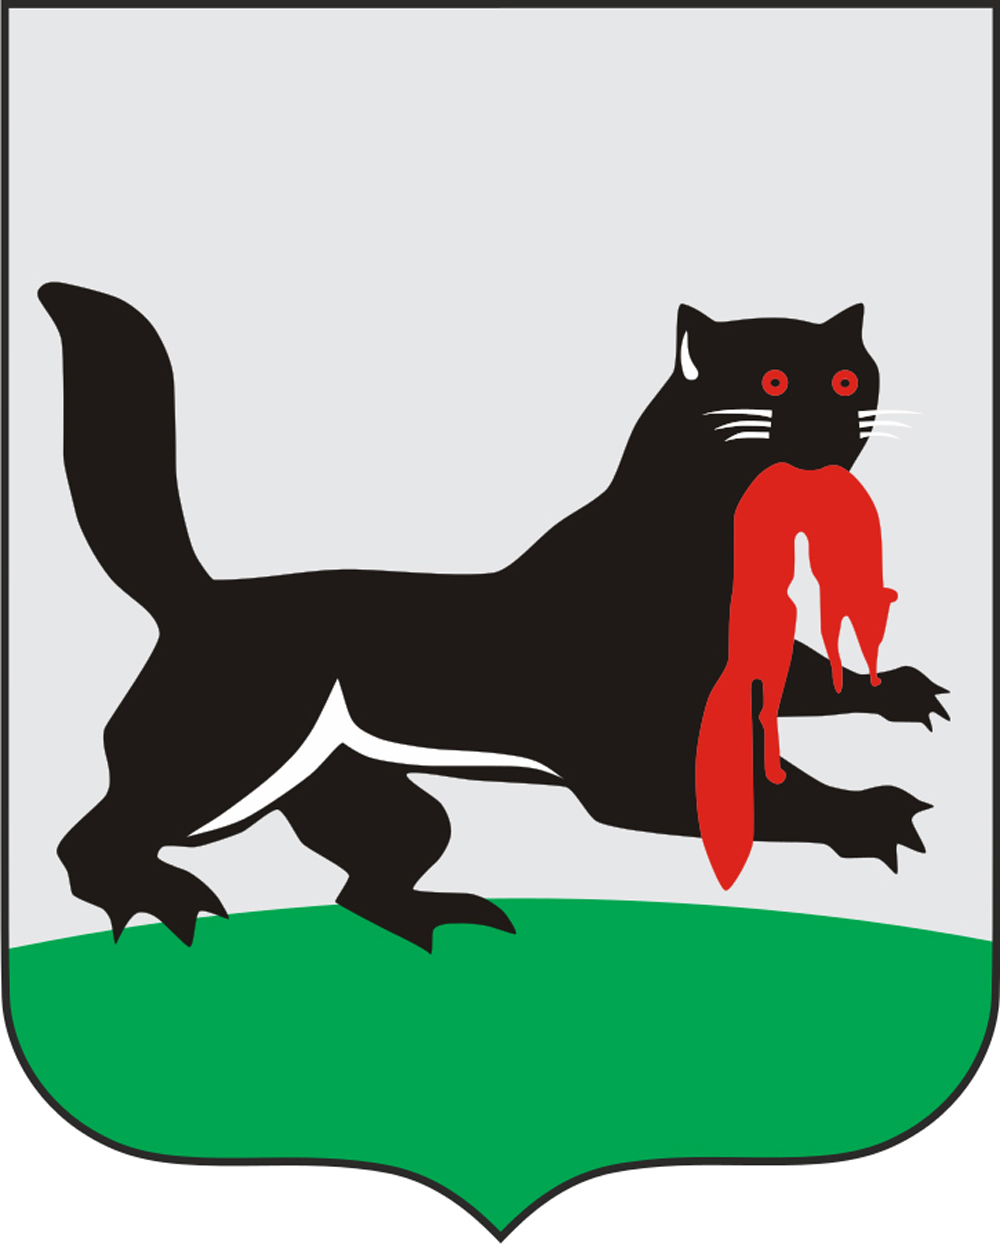 Grb Irkutska (Sibir, 4 200 km istočno od Moskve).